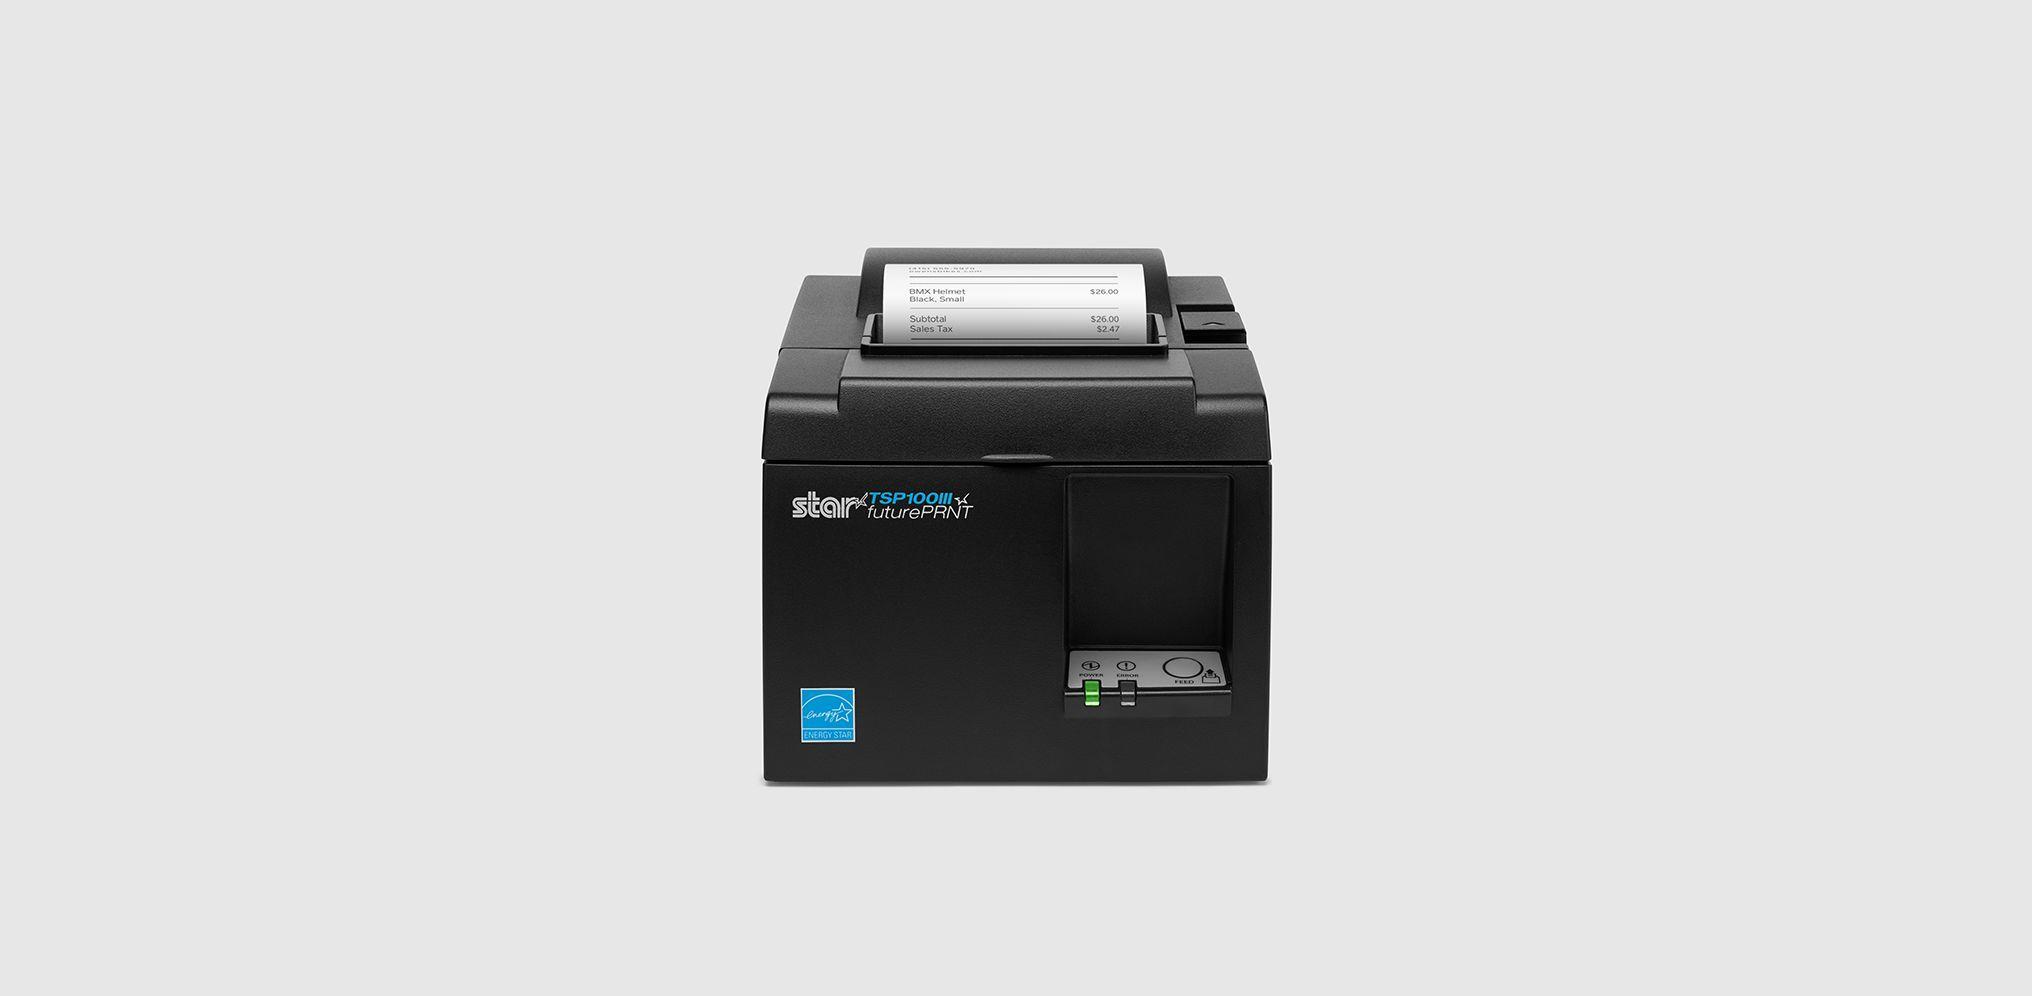 Usb Receipt Printer Square